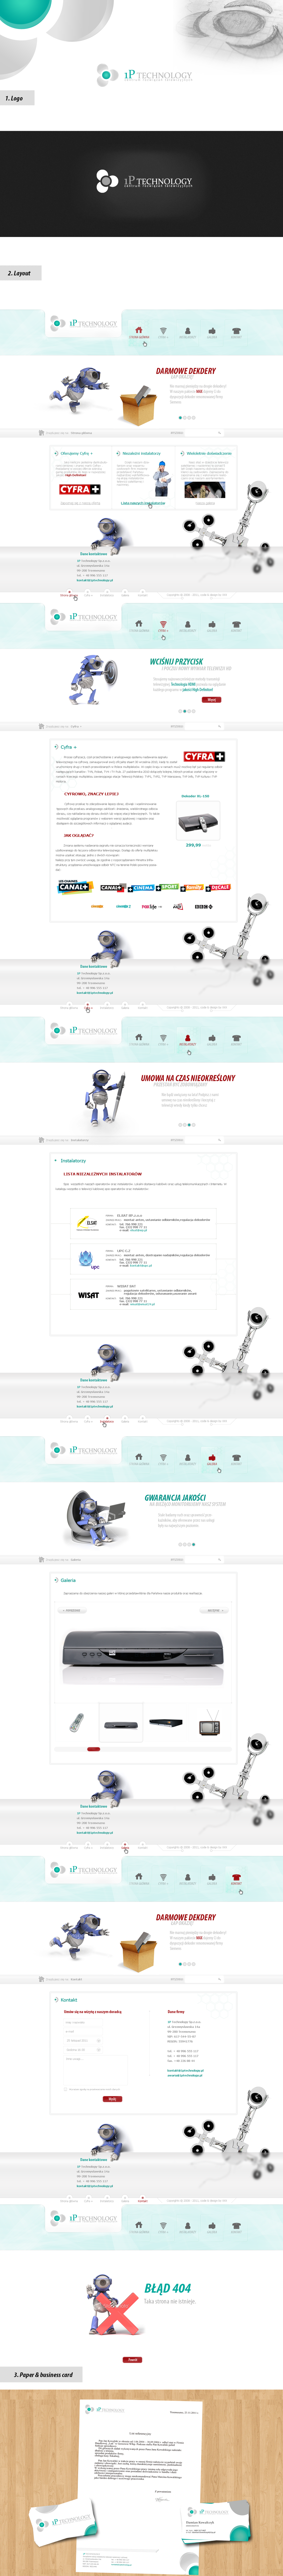 1P Technology layout by minspire